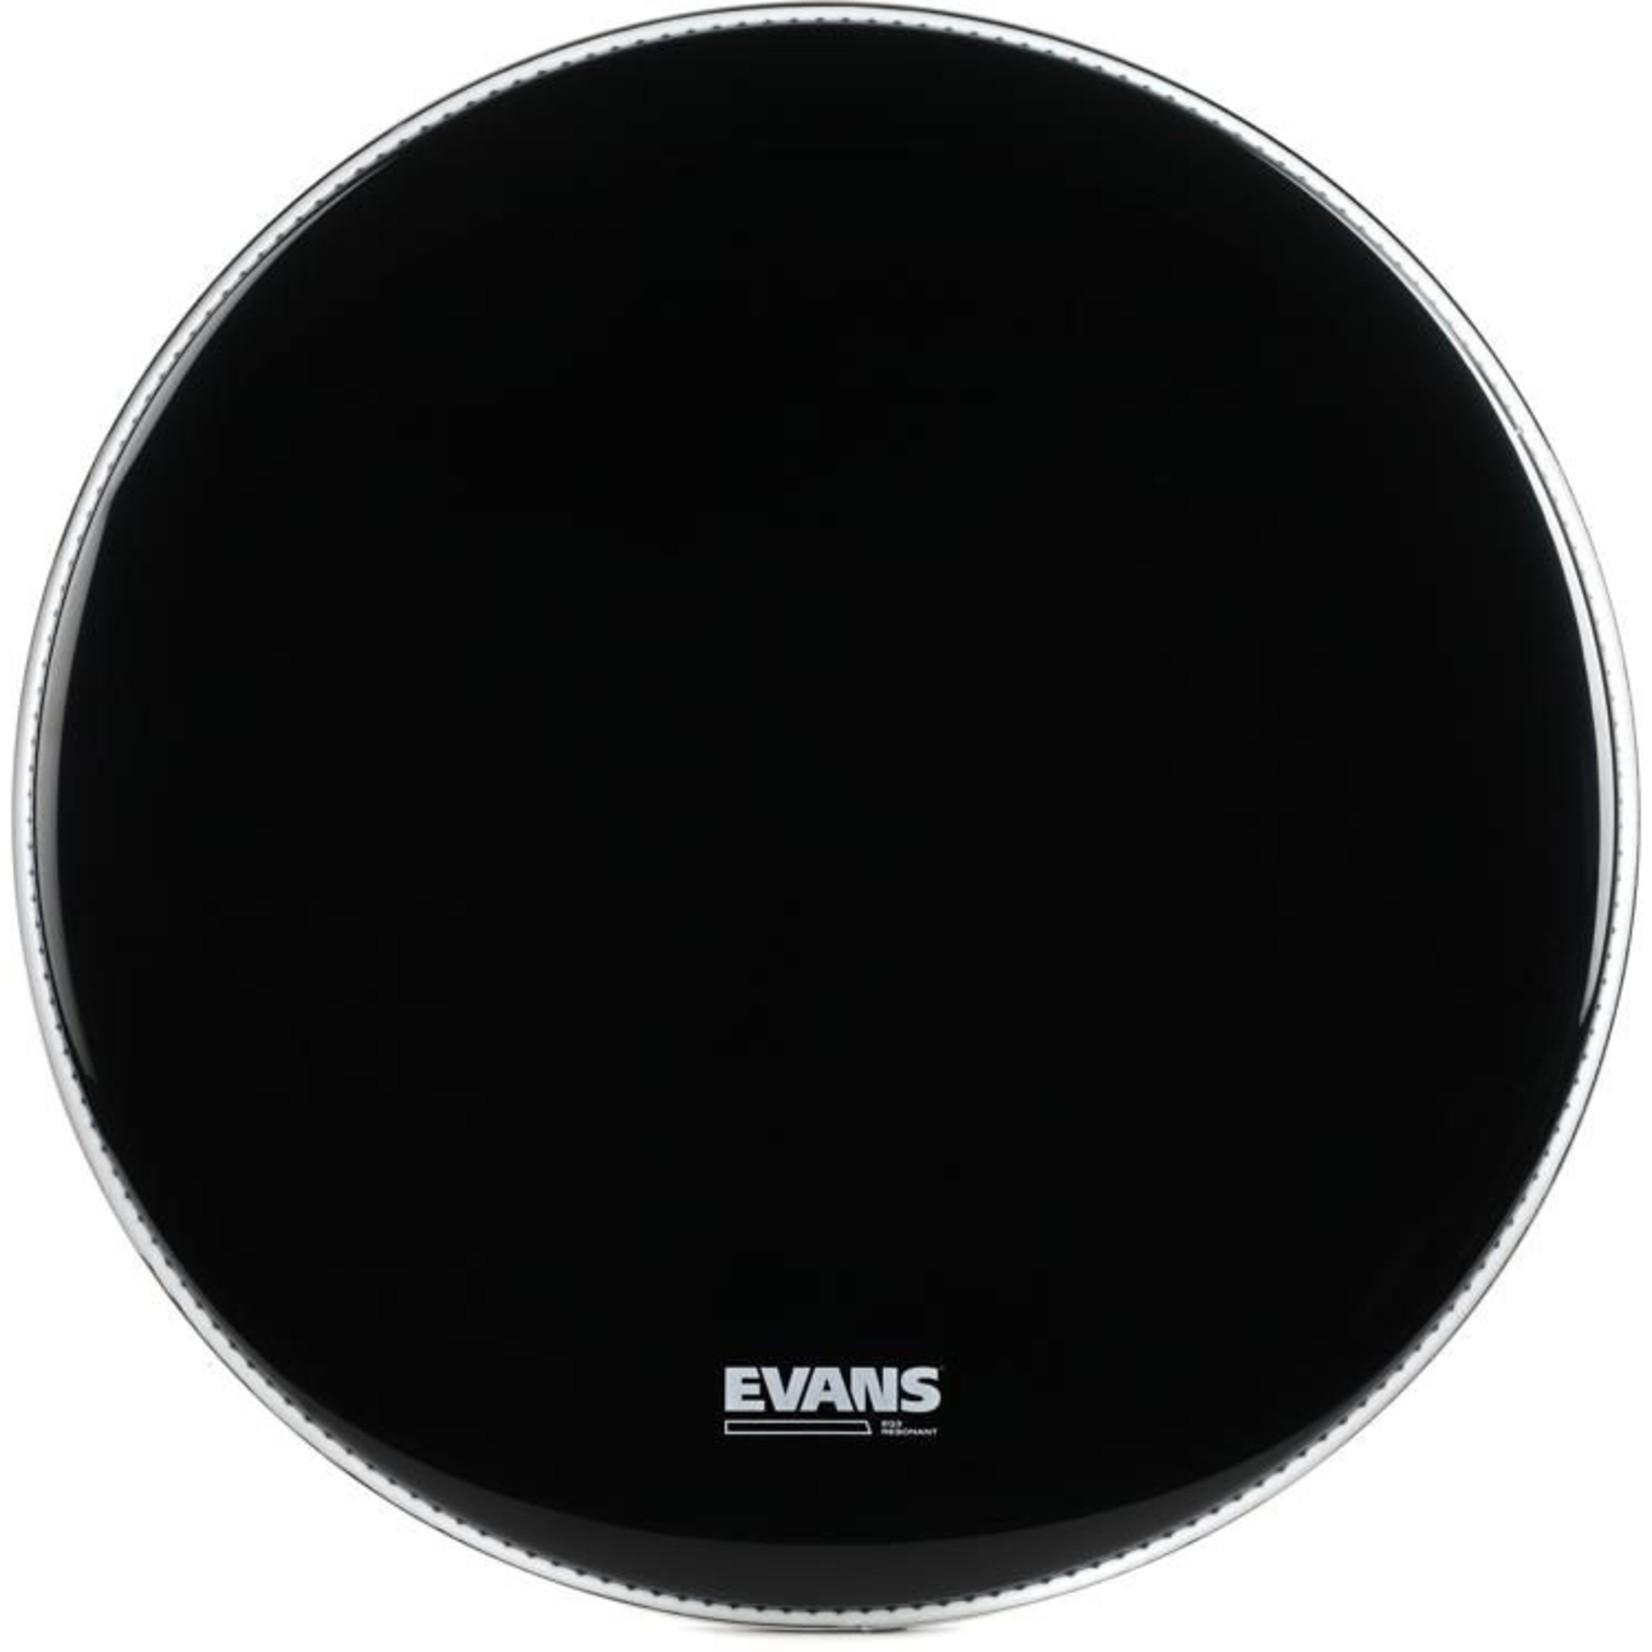 Evans Evans Black EQ3 Bass Drum Reso no Port